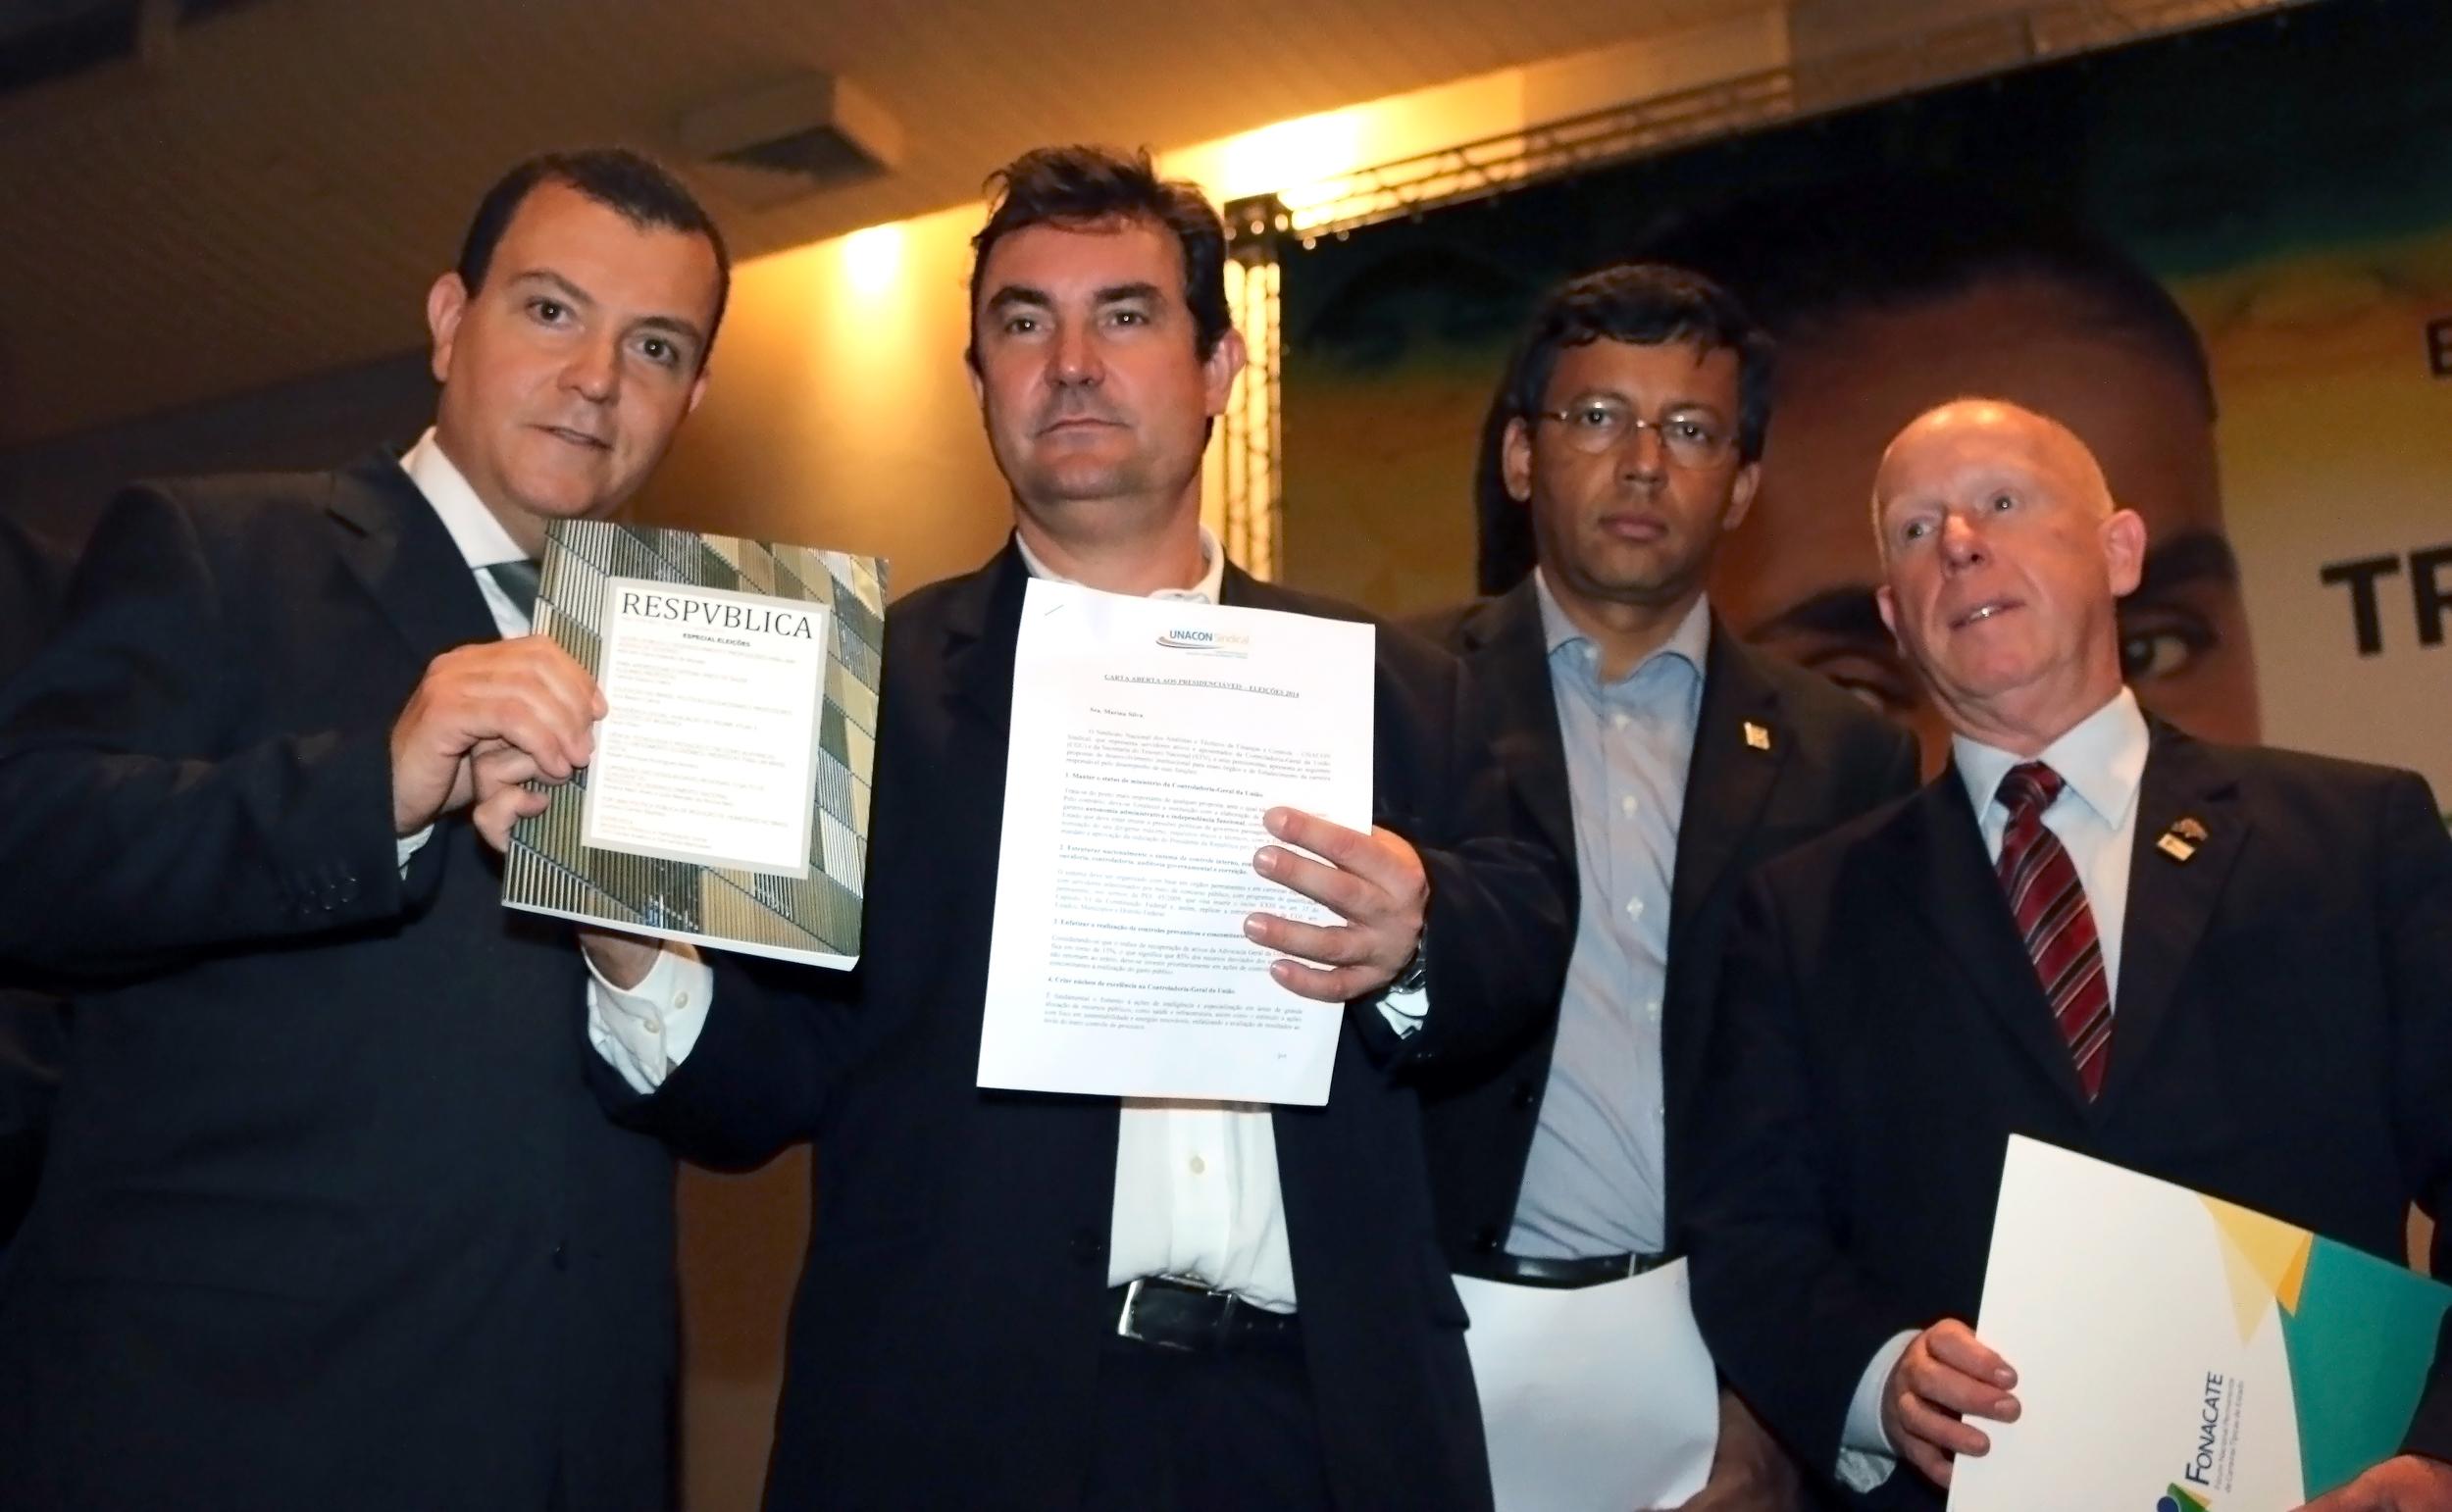 João Aurélio (ANESP), Alexandre Navarro (comitê Marina Silva), Eduardo Rodrigues (Assecor) e Roberto Kupski (Fonacate). Foto: Filipe Calmon / ANESP